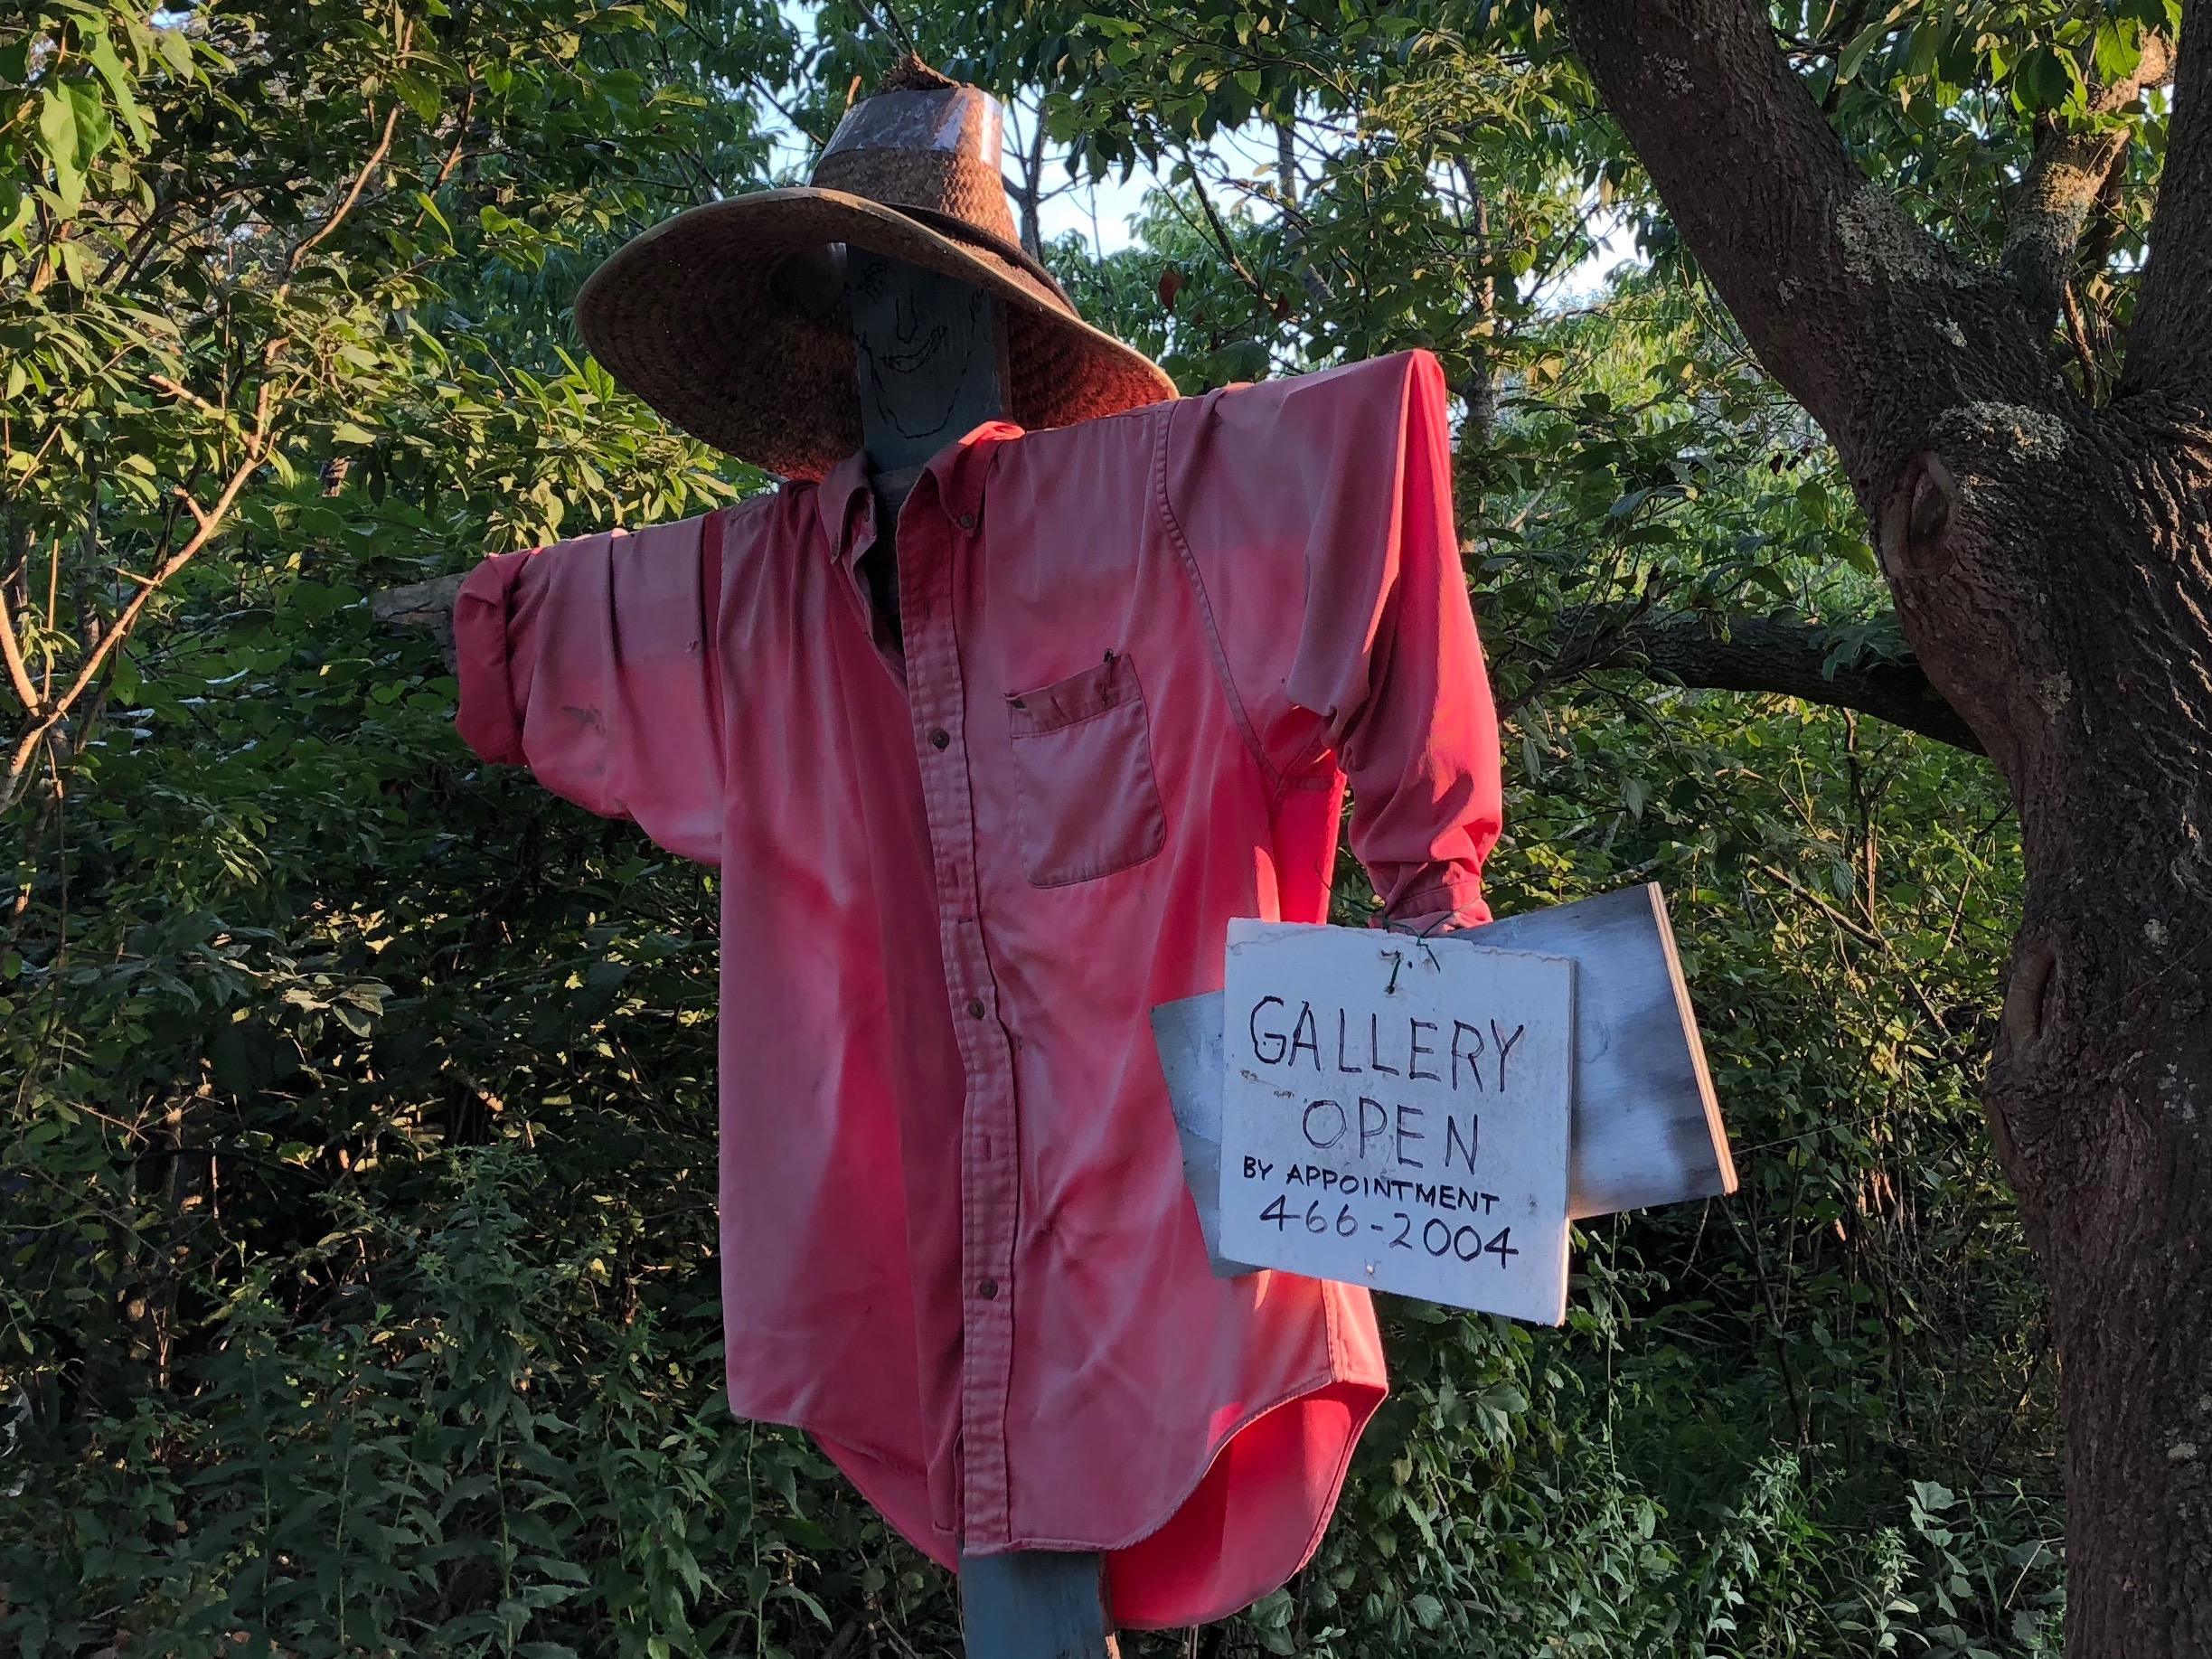 082818-scarecrow-gallery-invitation